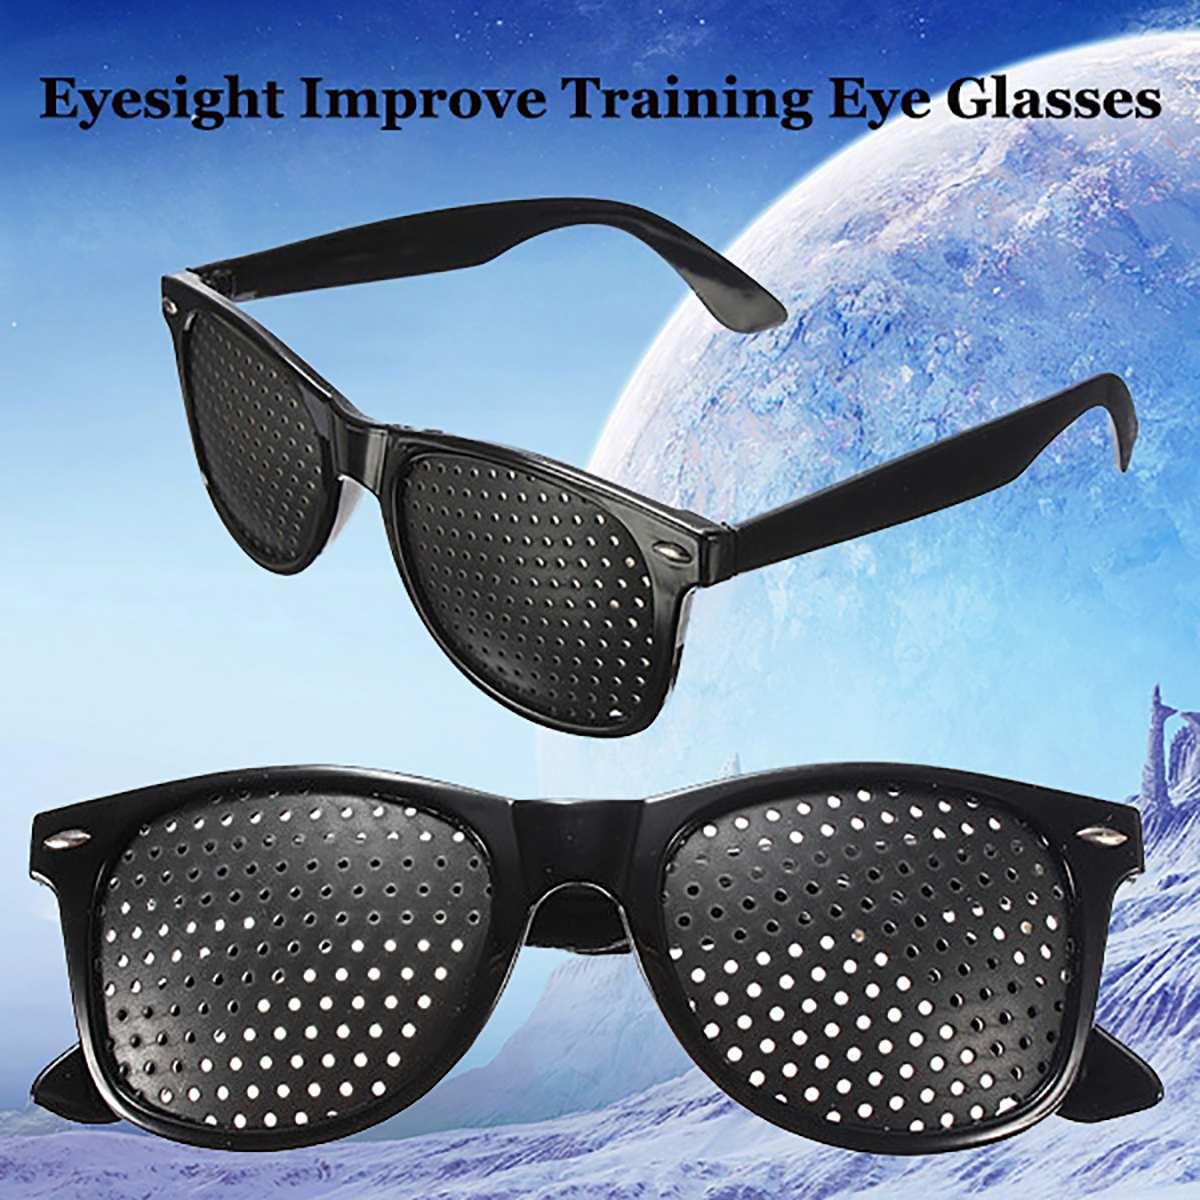 Black Unisex Vision Care Pinholes Eye Exercise Eyeglasses Pinholes Glasses Eyesight Improve Plastic High Quality